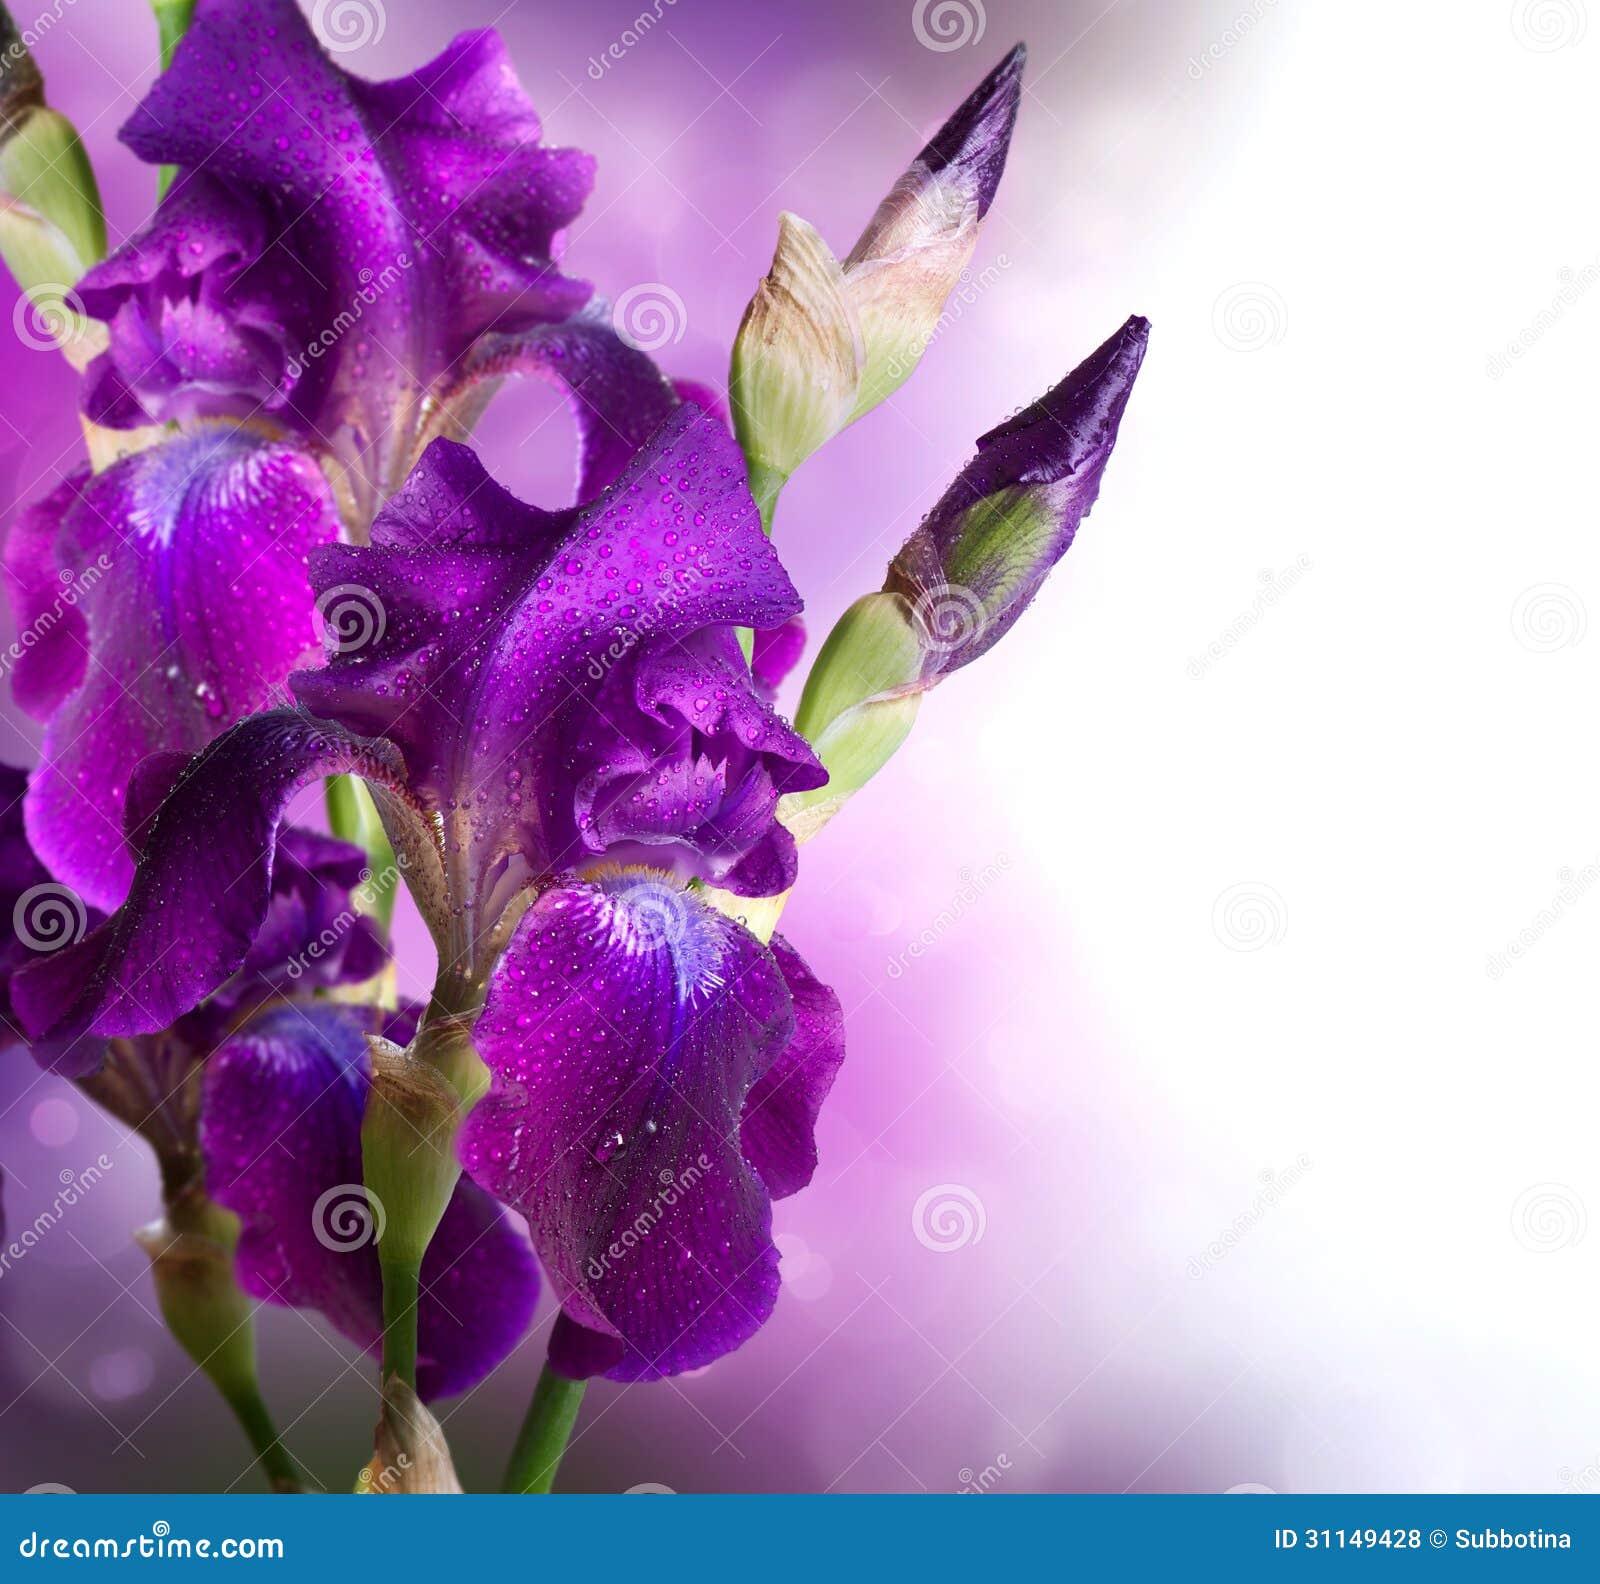 Iris flowers art design stock photo image of color beautiful iris flowers art design izmirmasajfo Images